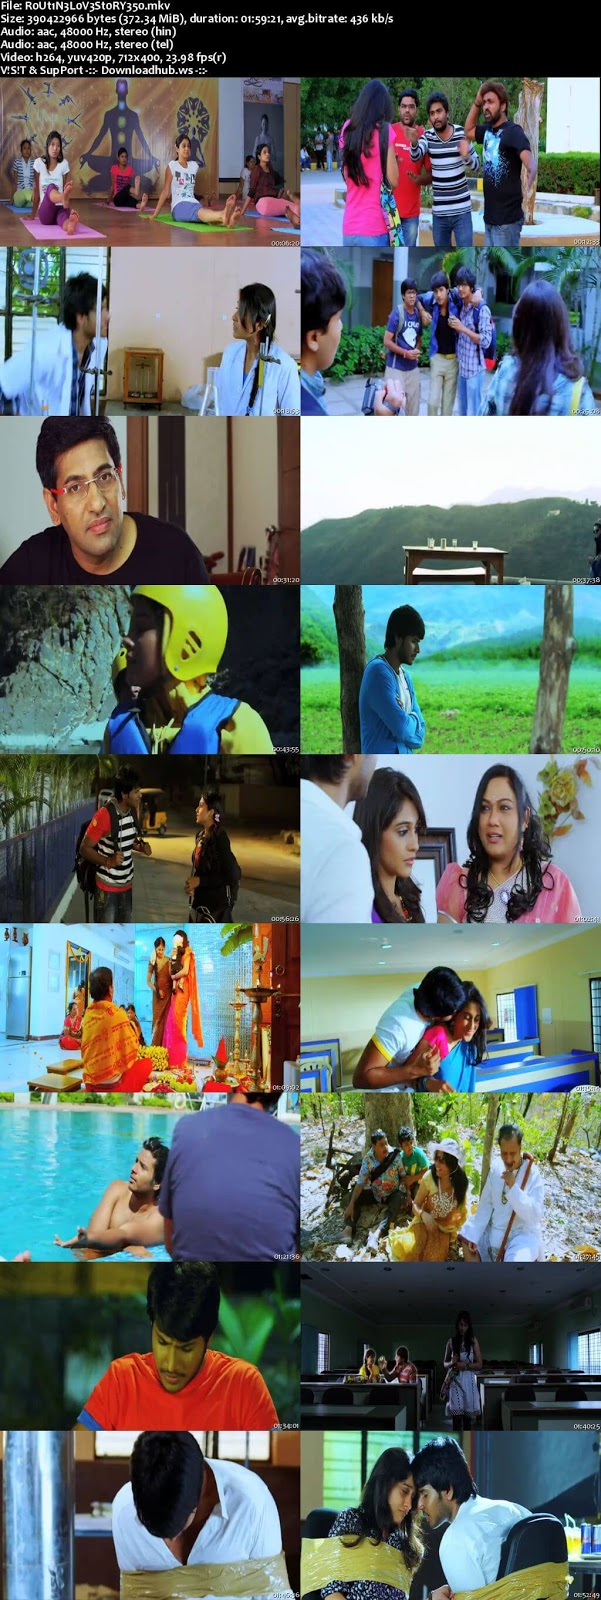 Routine Love Story 2012 UNCUT Hindi Dual Audio 480p BluRay Free Download